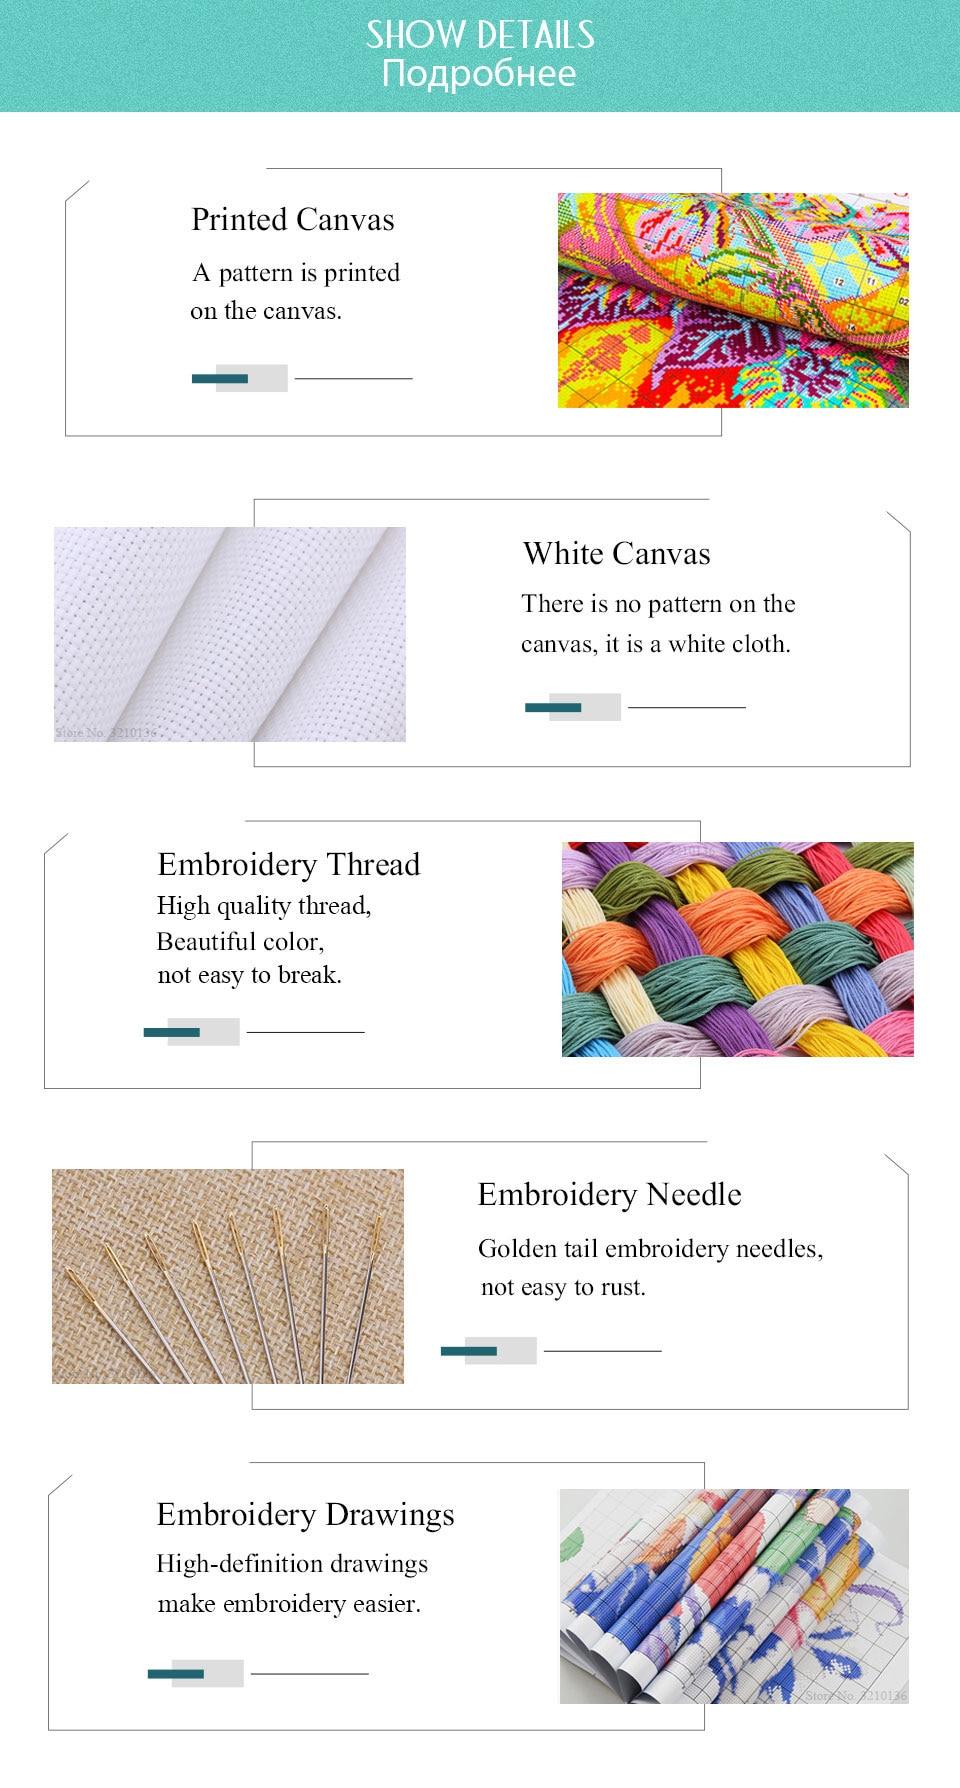 Joy Sunday Cross Stitch Kits Sale 11CT 14CT Embroidery Cross Stitch Kit for Needlework Cross Stitch Sets for Embroidery DIY Crafts (5)